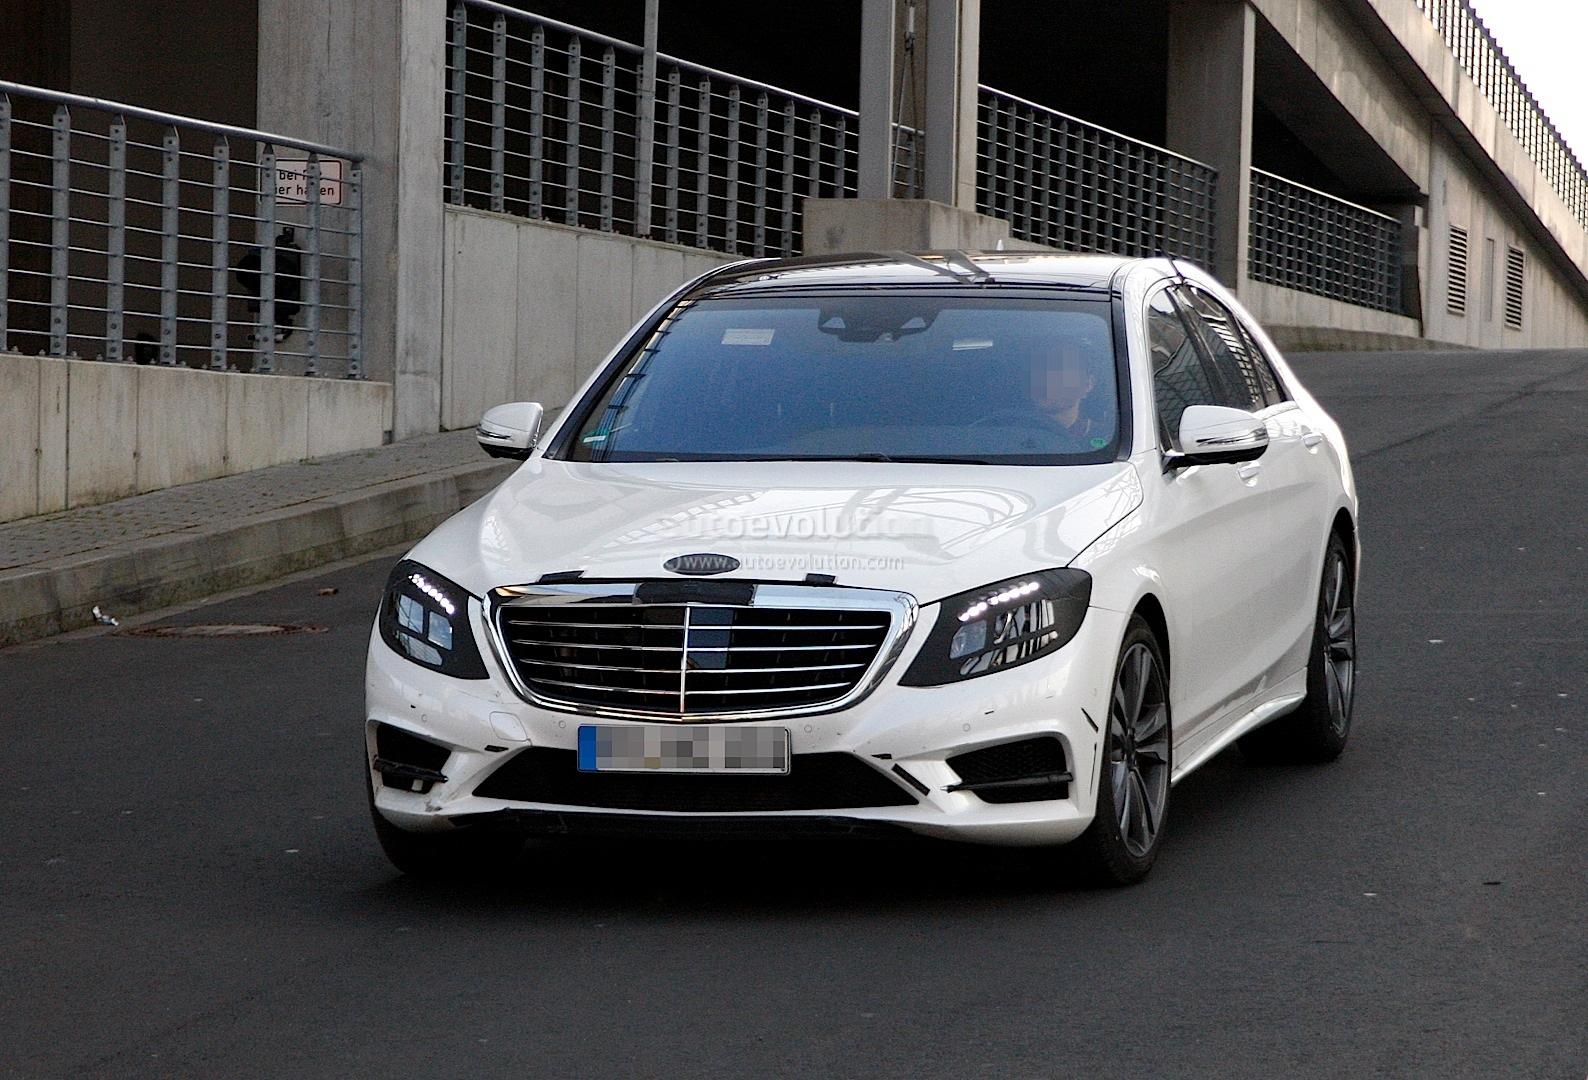 Toyota Of Pullman >> Spyshots: 2014 W222 Mercedes-Benz S-Class Almost Undisguised - autoevolution